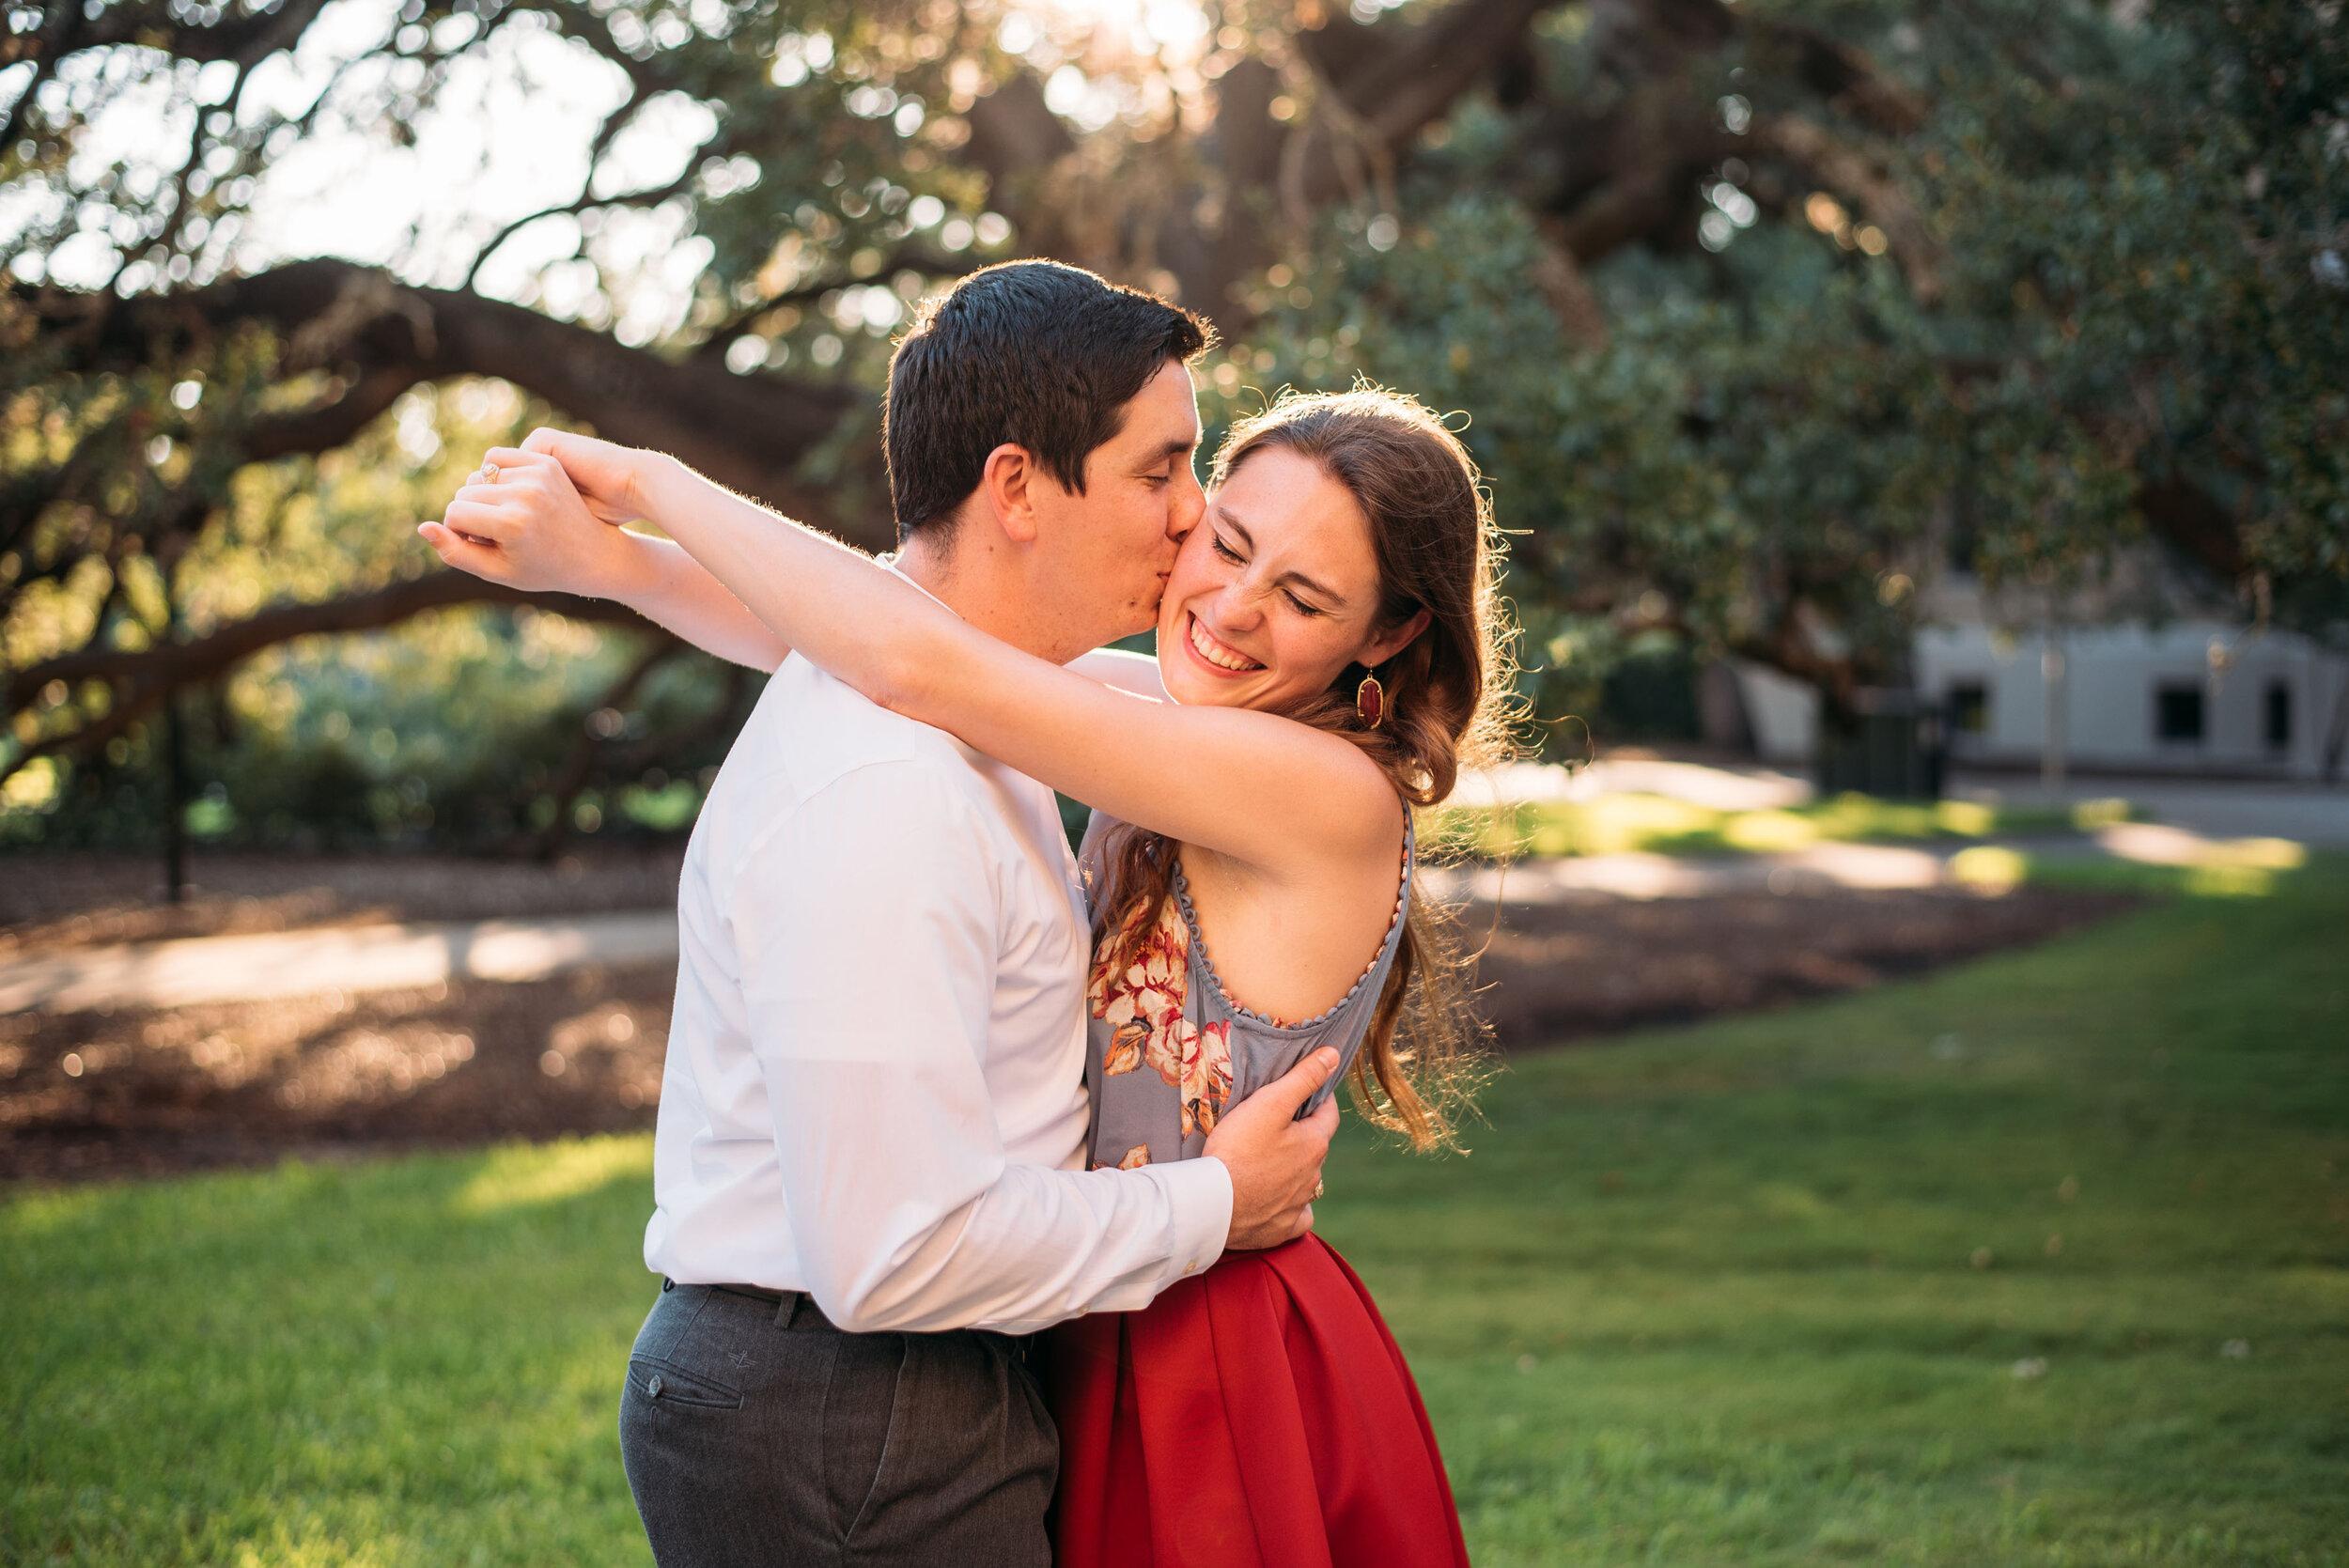 Texas-A&M-University-Engagement-Session-Century-Tree-Military-Walk-College-Station-Wedding-Photographer-San-Angel-Photo-Tony-Kate-12.jpg